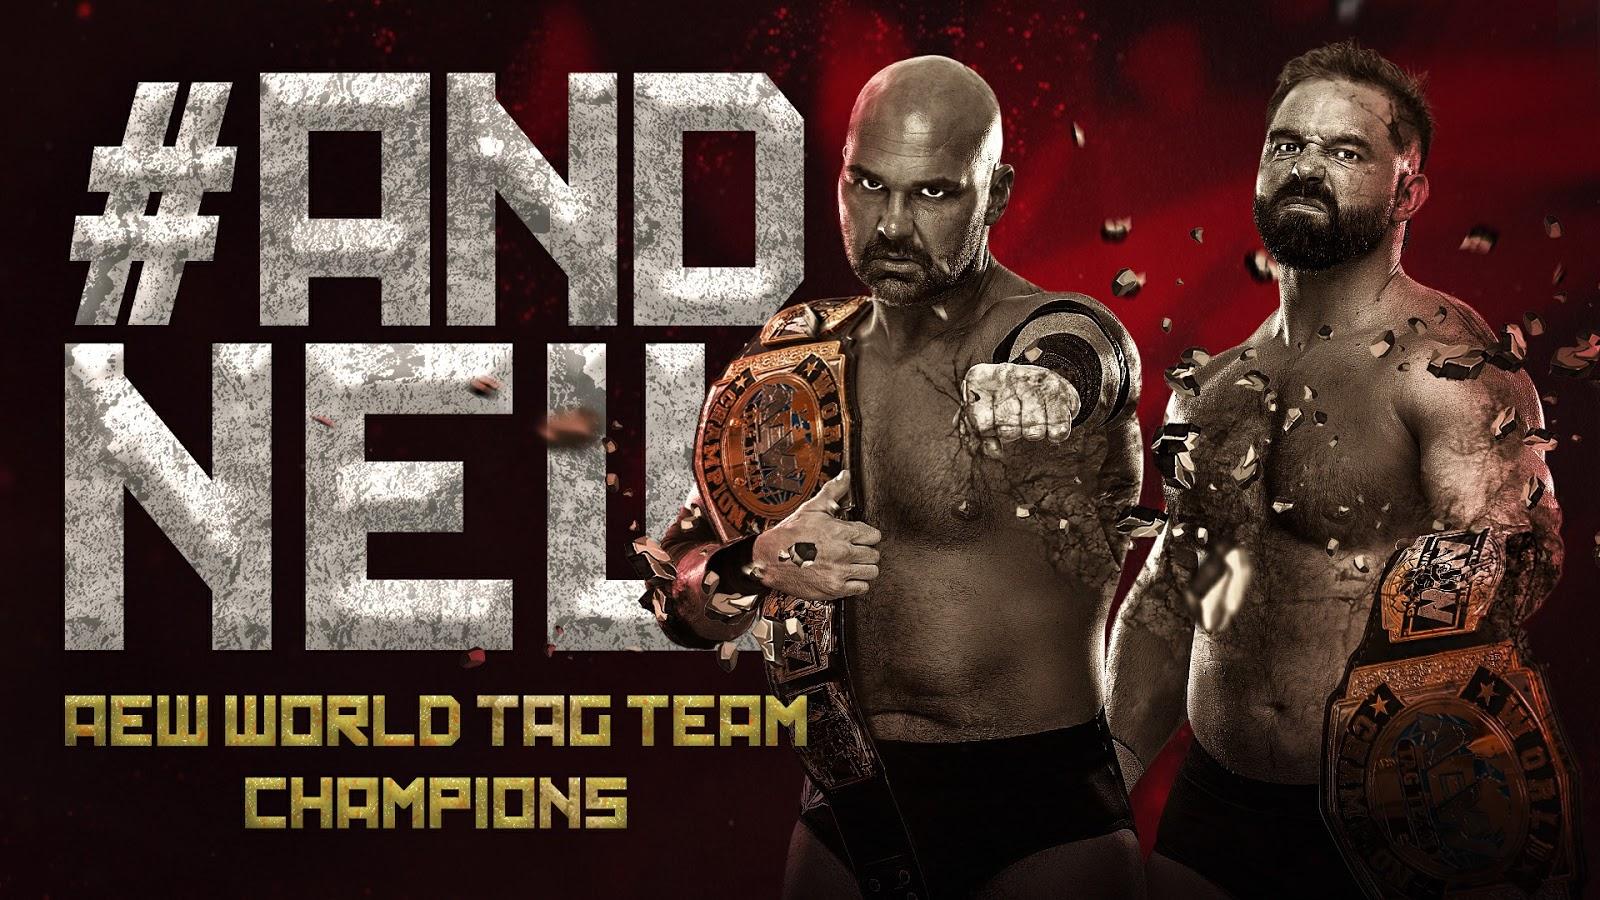 FTR conquistam o AEW World Tag Team Championship